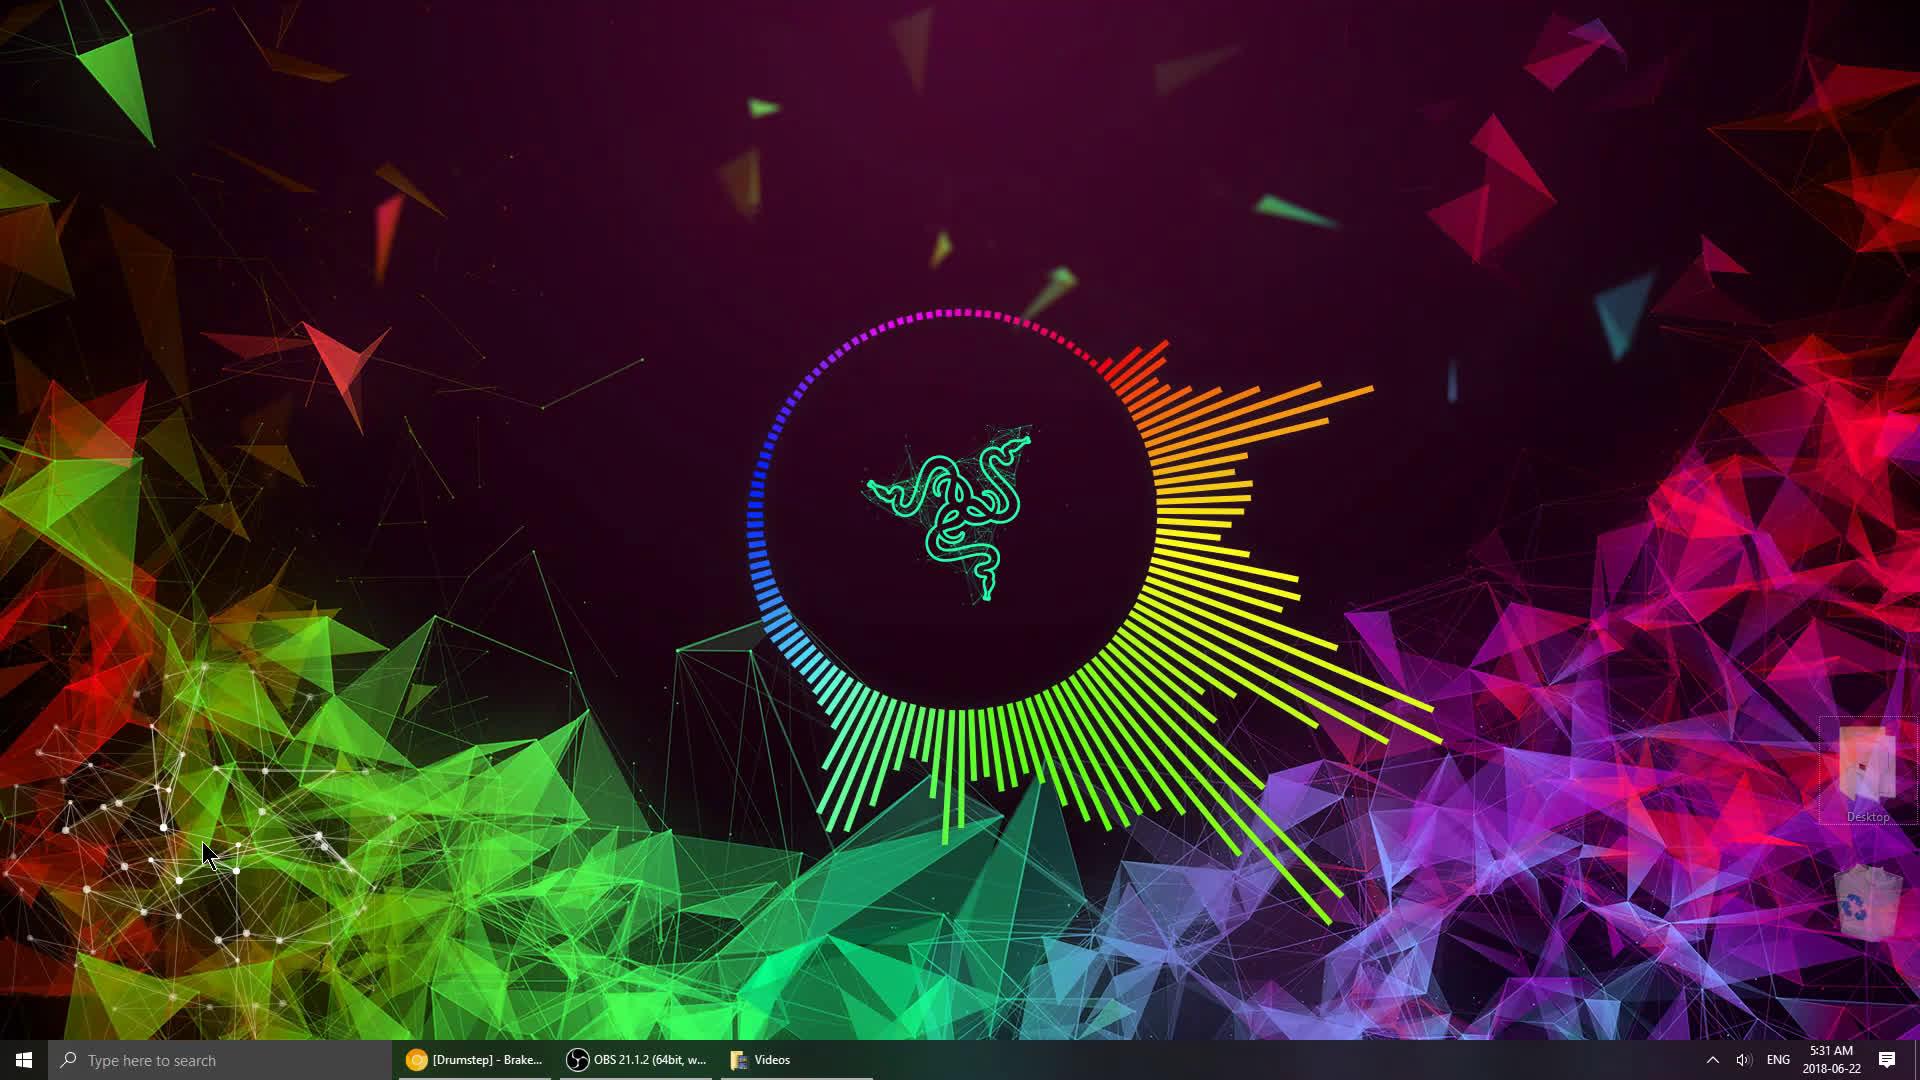 Razer Wallpaper Wallpaper Engine Audio Visualizer ...